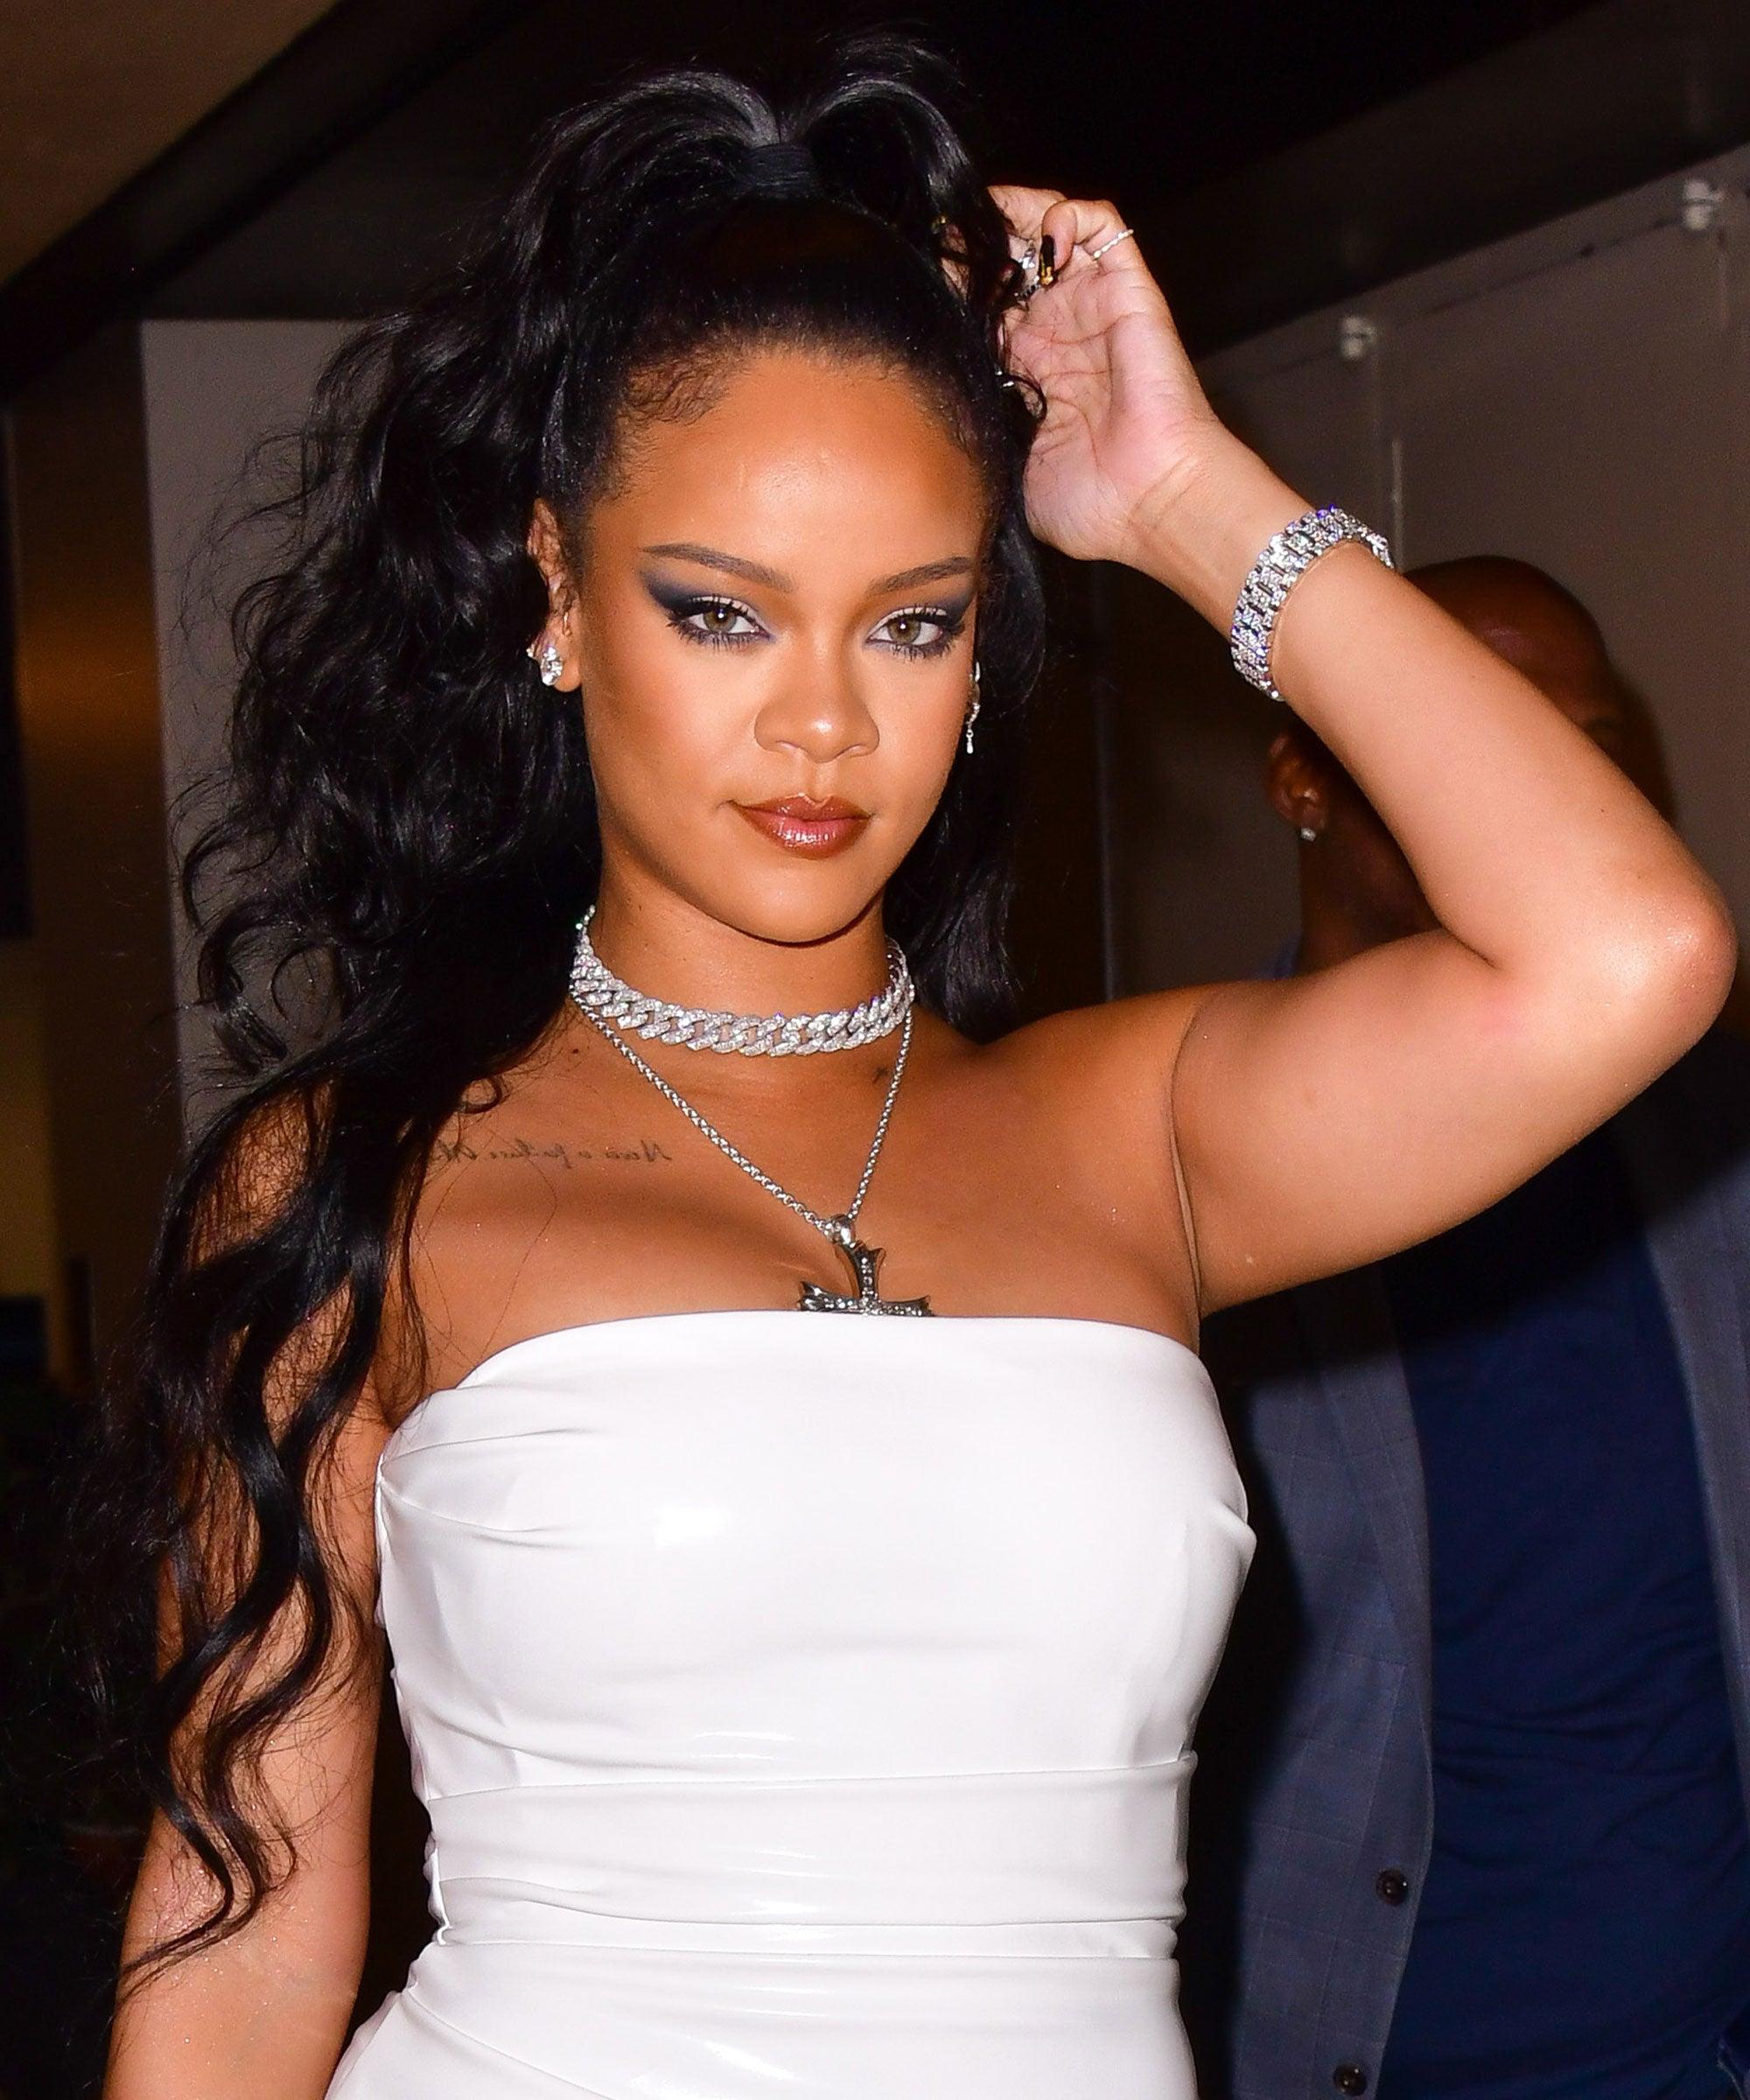 Yatt Hamzah Kagum Usaha Murni Rihanna Bantu Penduduk Lubnan